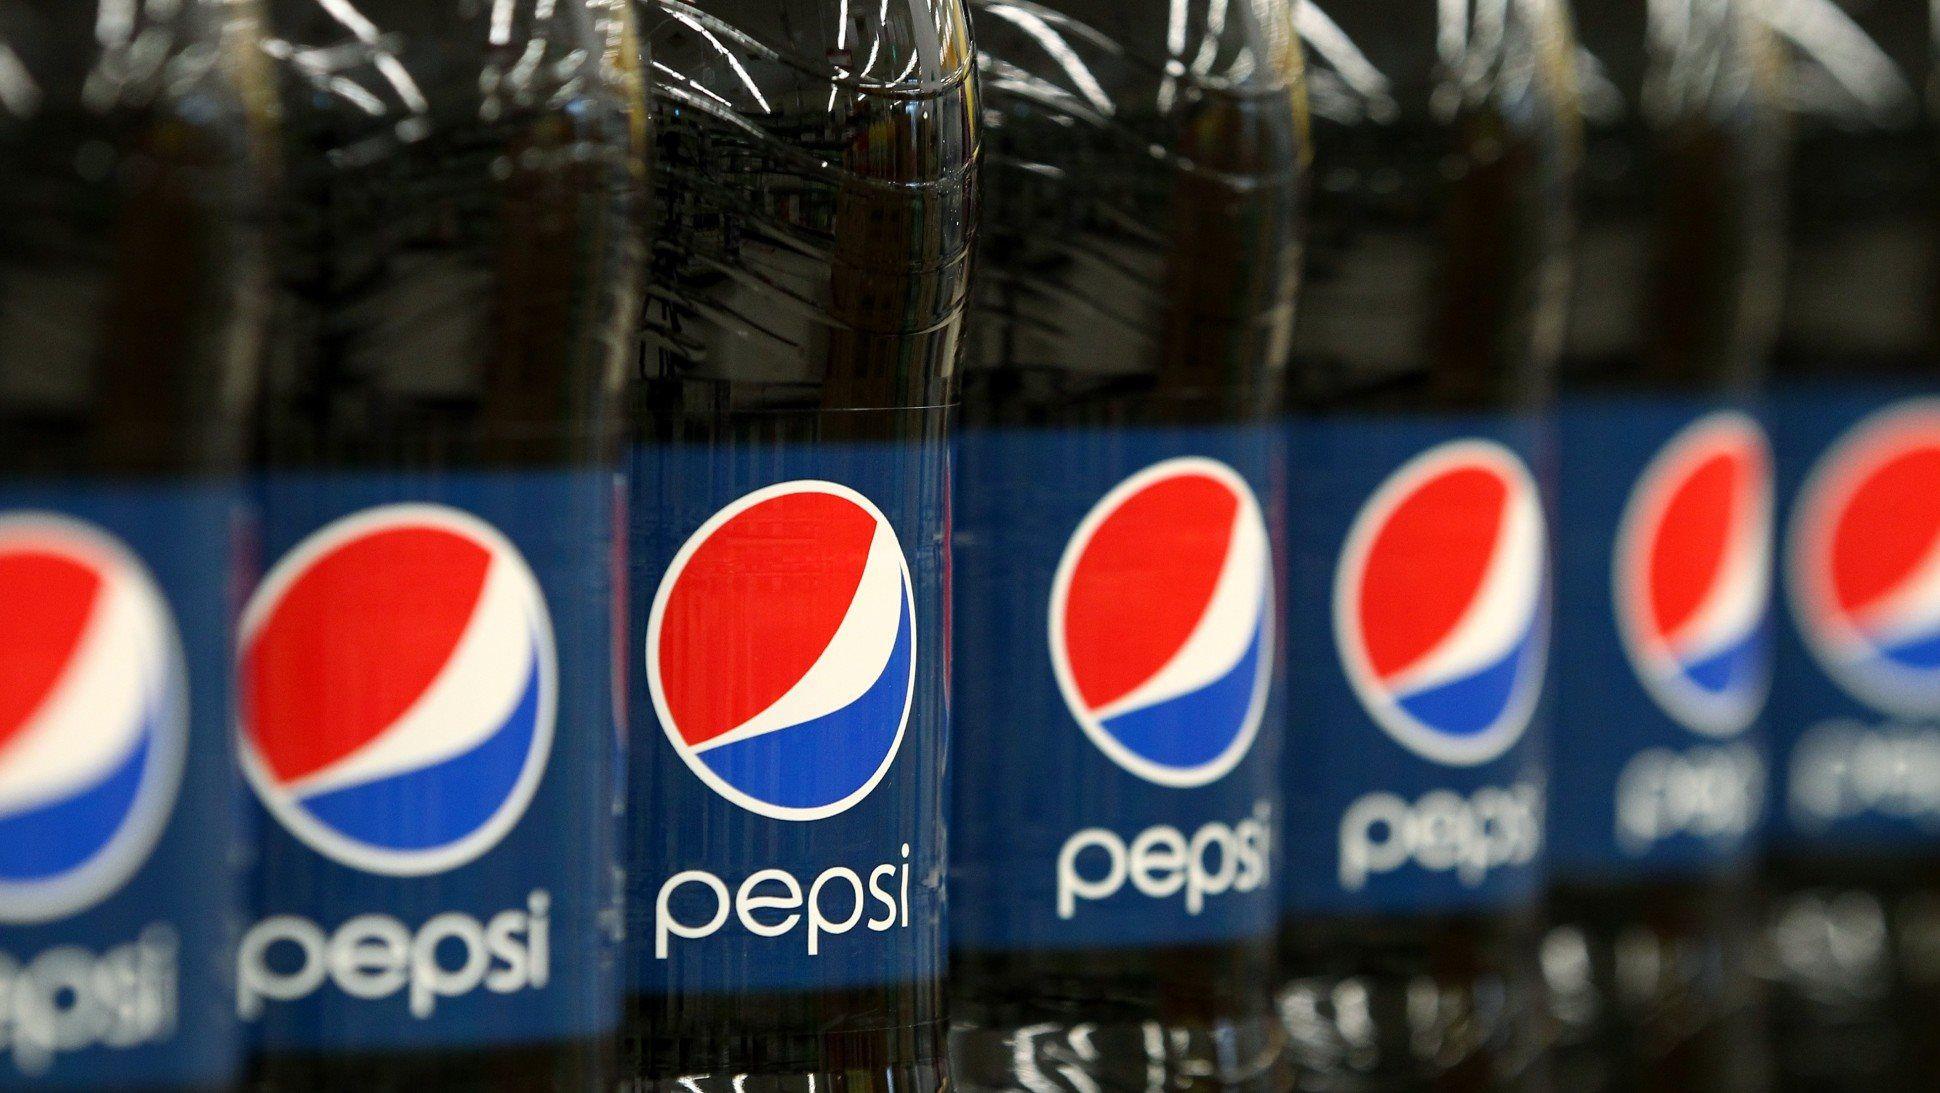 Pepsi Bottle